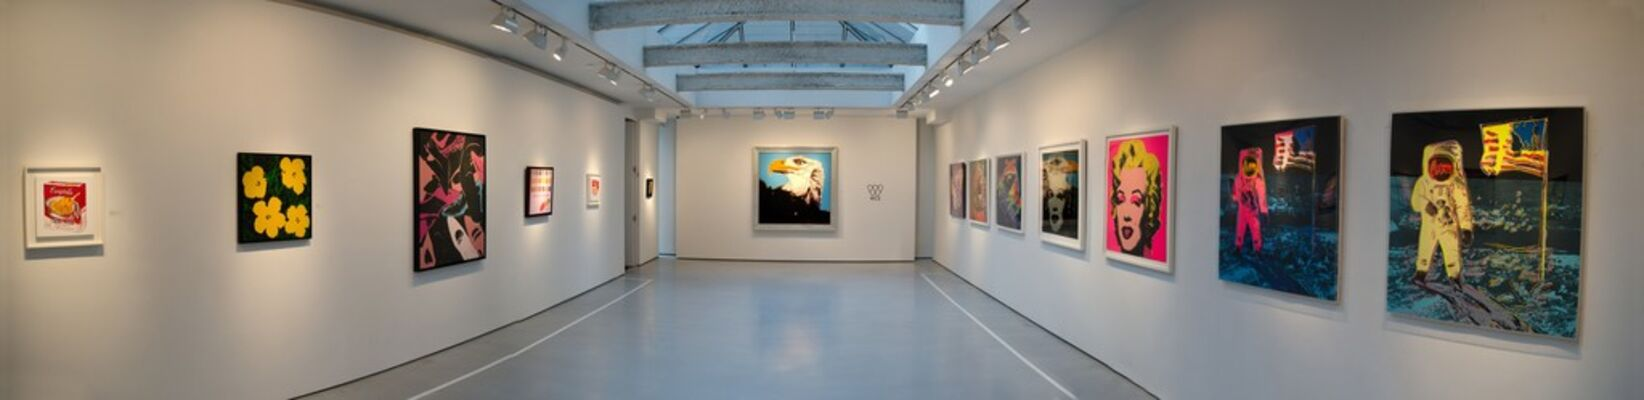 Andy Warhol: Idolized, installation view